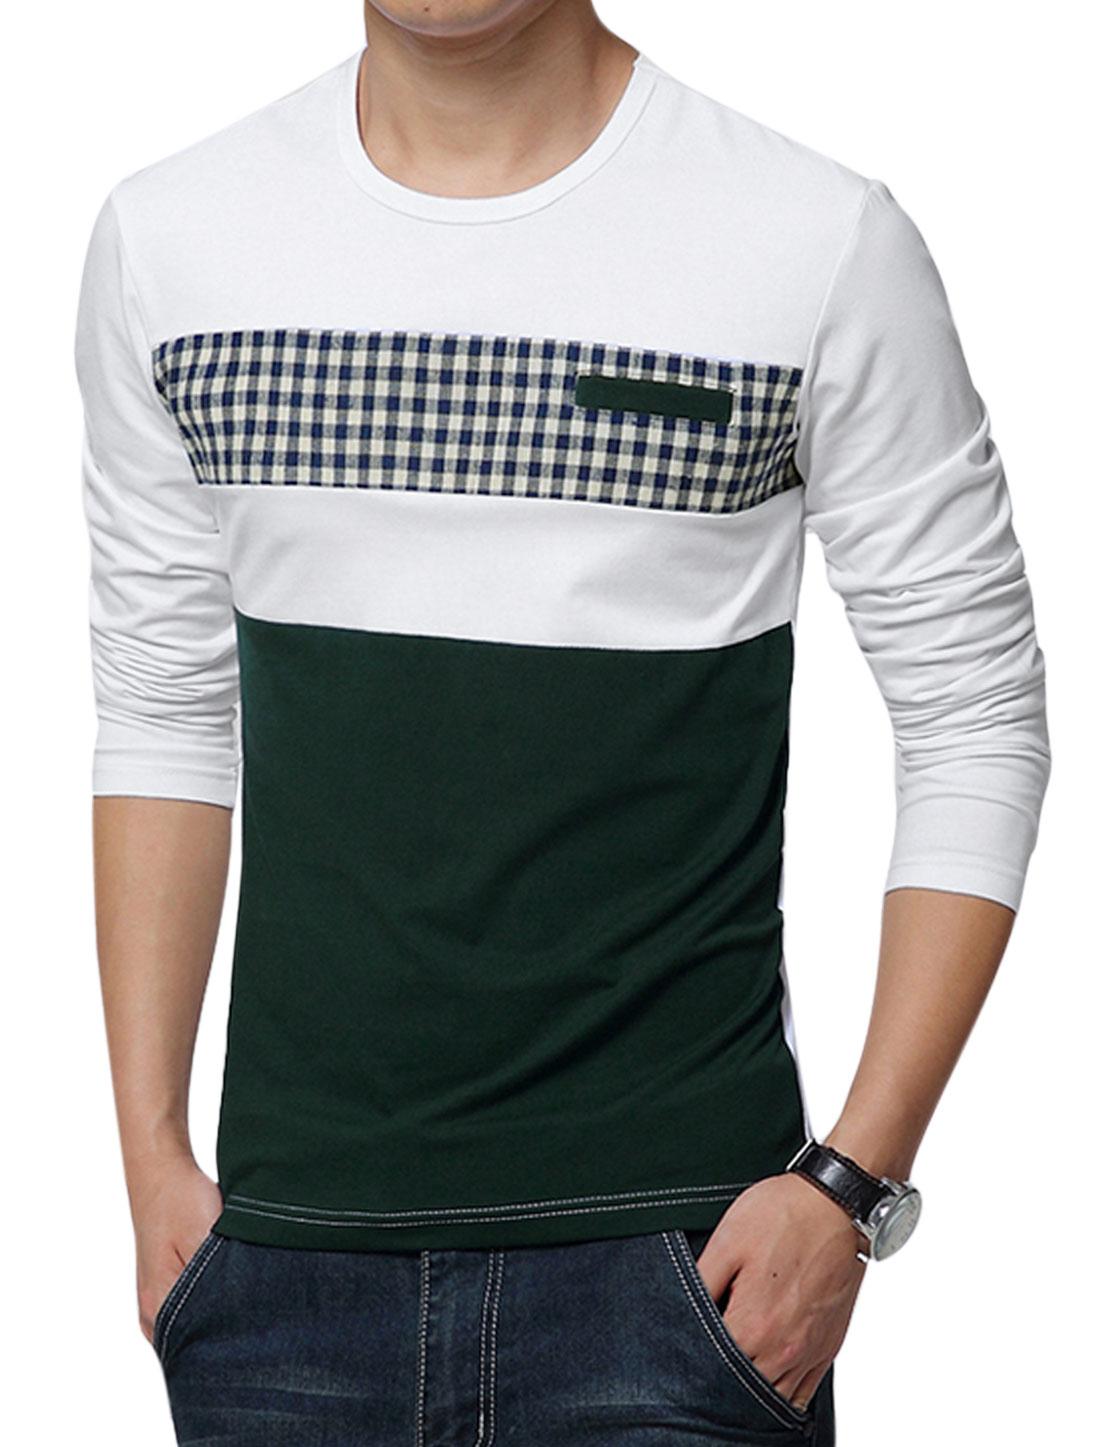 Men Plaids Print Contrast Color Slim Fit T-Shirt White Dark Green M